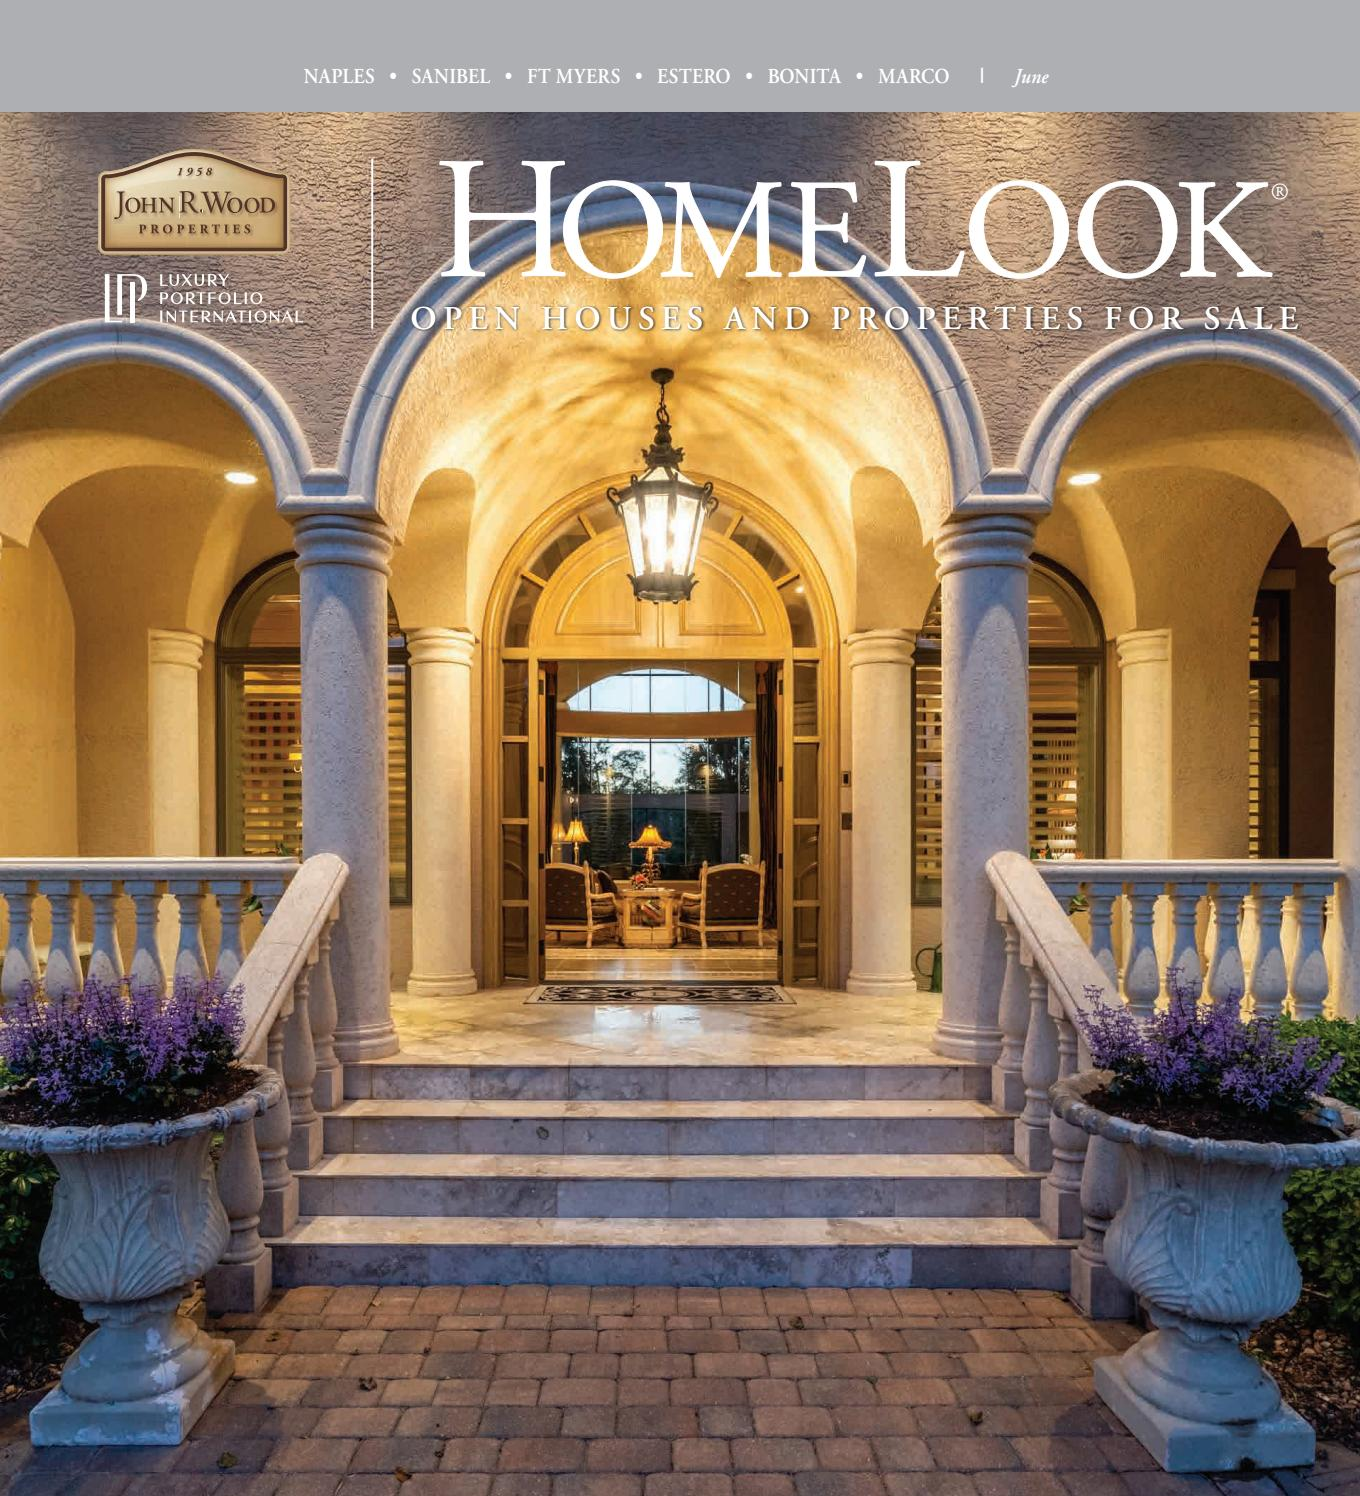 Home Look Magazine June 2019 By John R Wood Properties